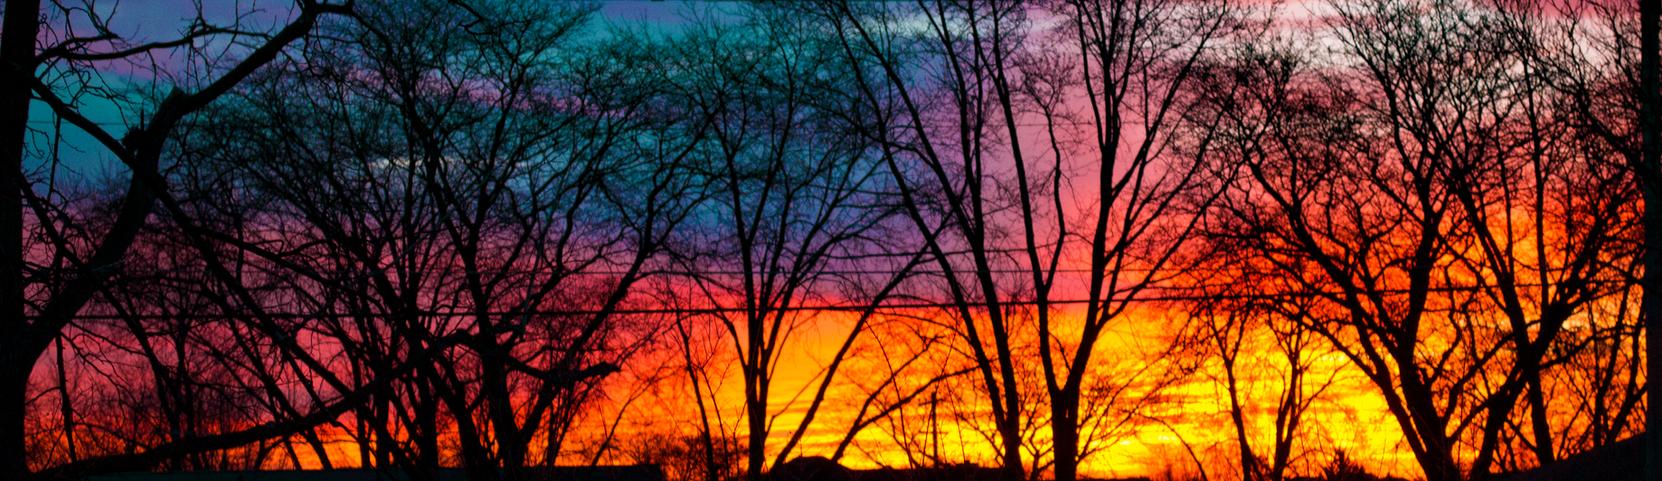 December Sunrise in Suburbia by Hearte42